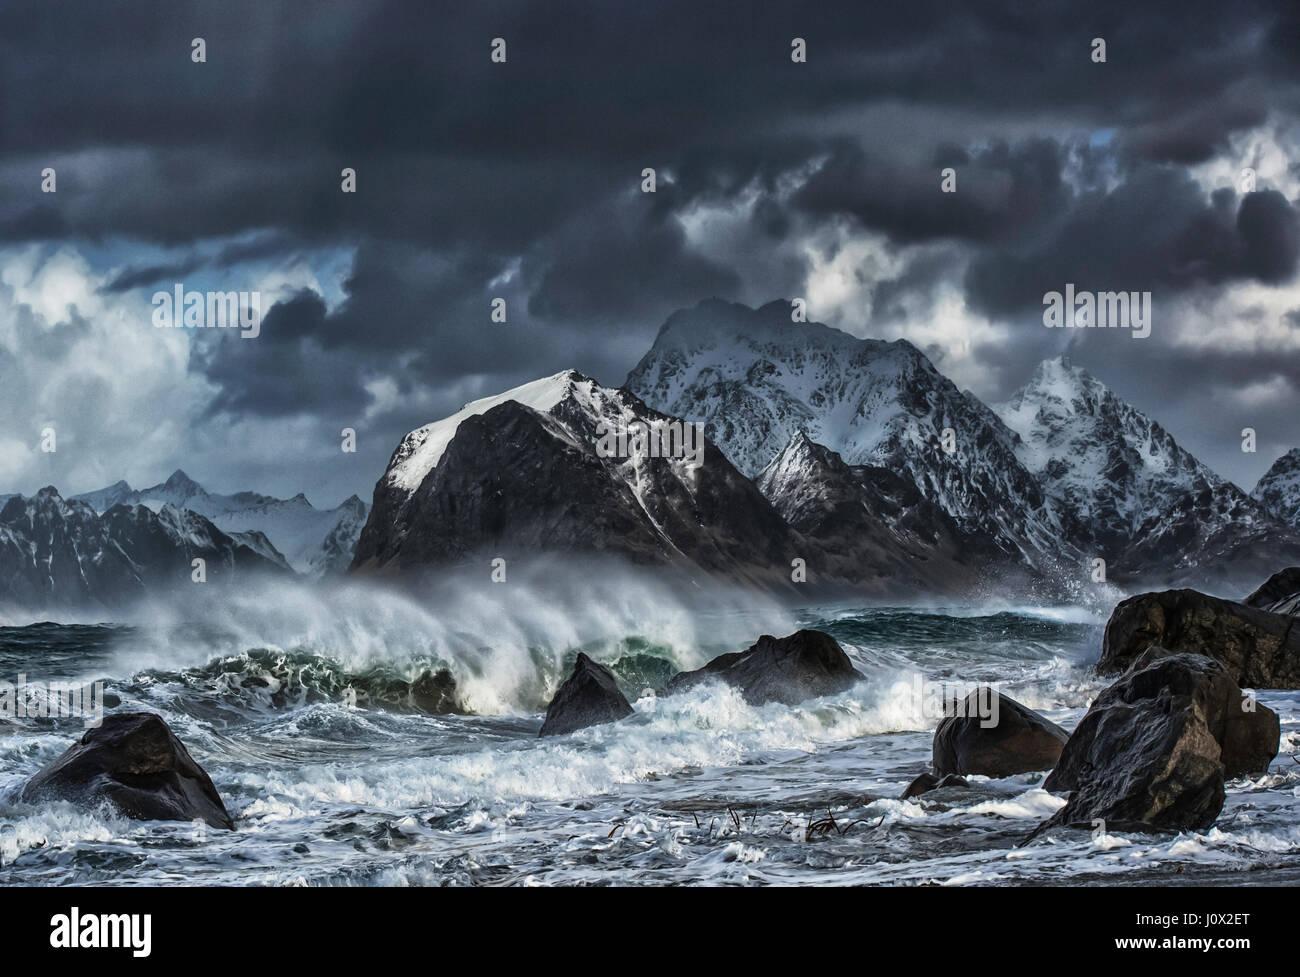 El mar embravecido, Myrland, Flakstad, Lofoten, Noruega Foto de stock